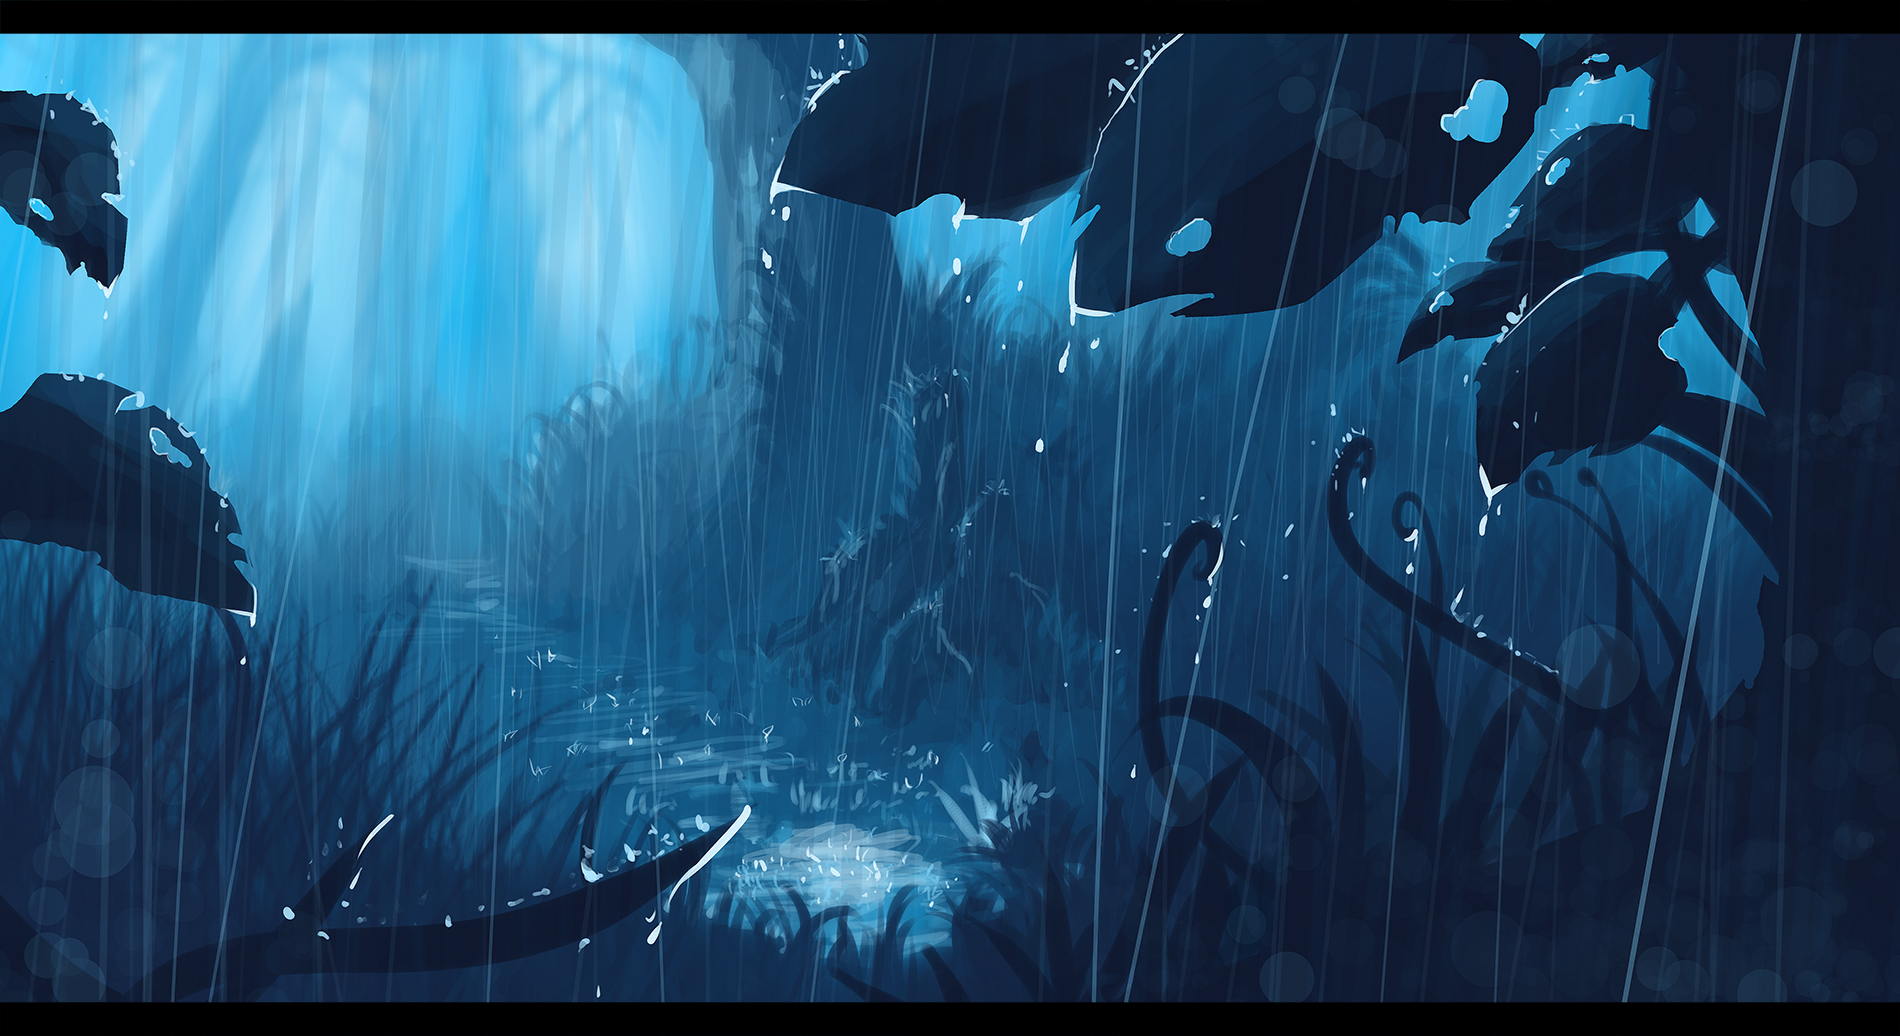 anime rain green wallpaper - photo #2